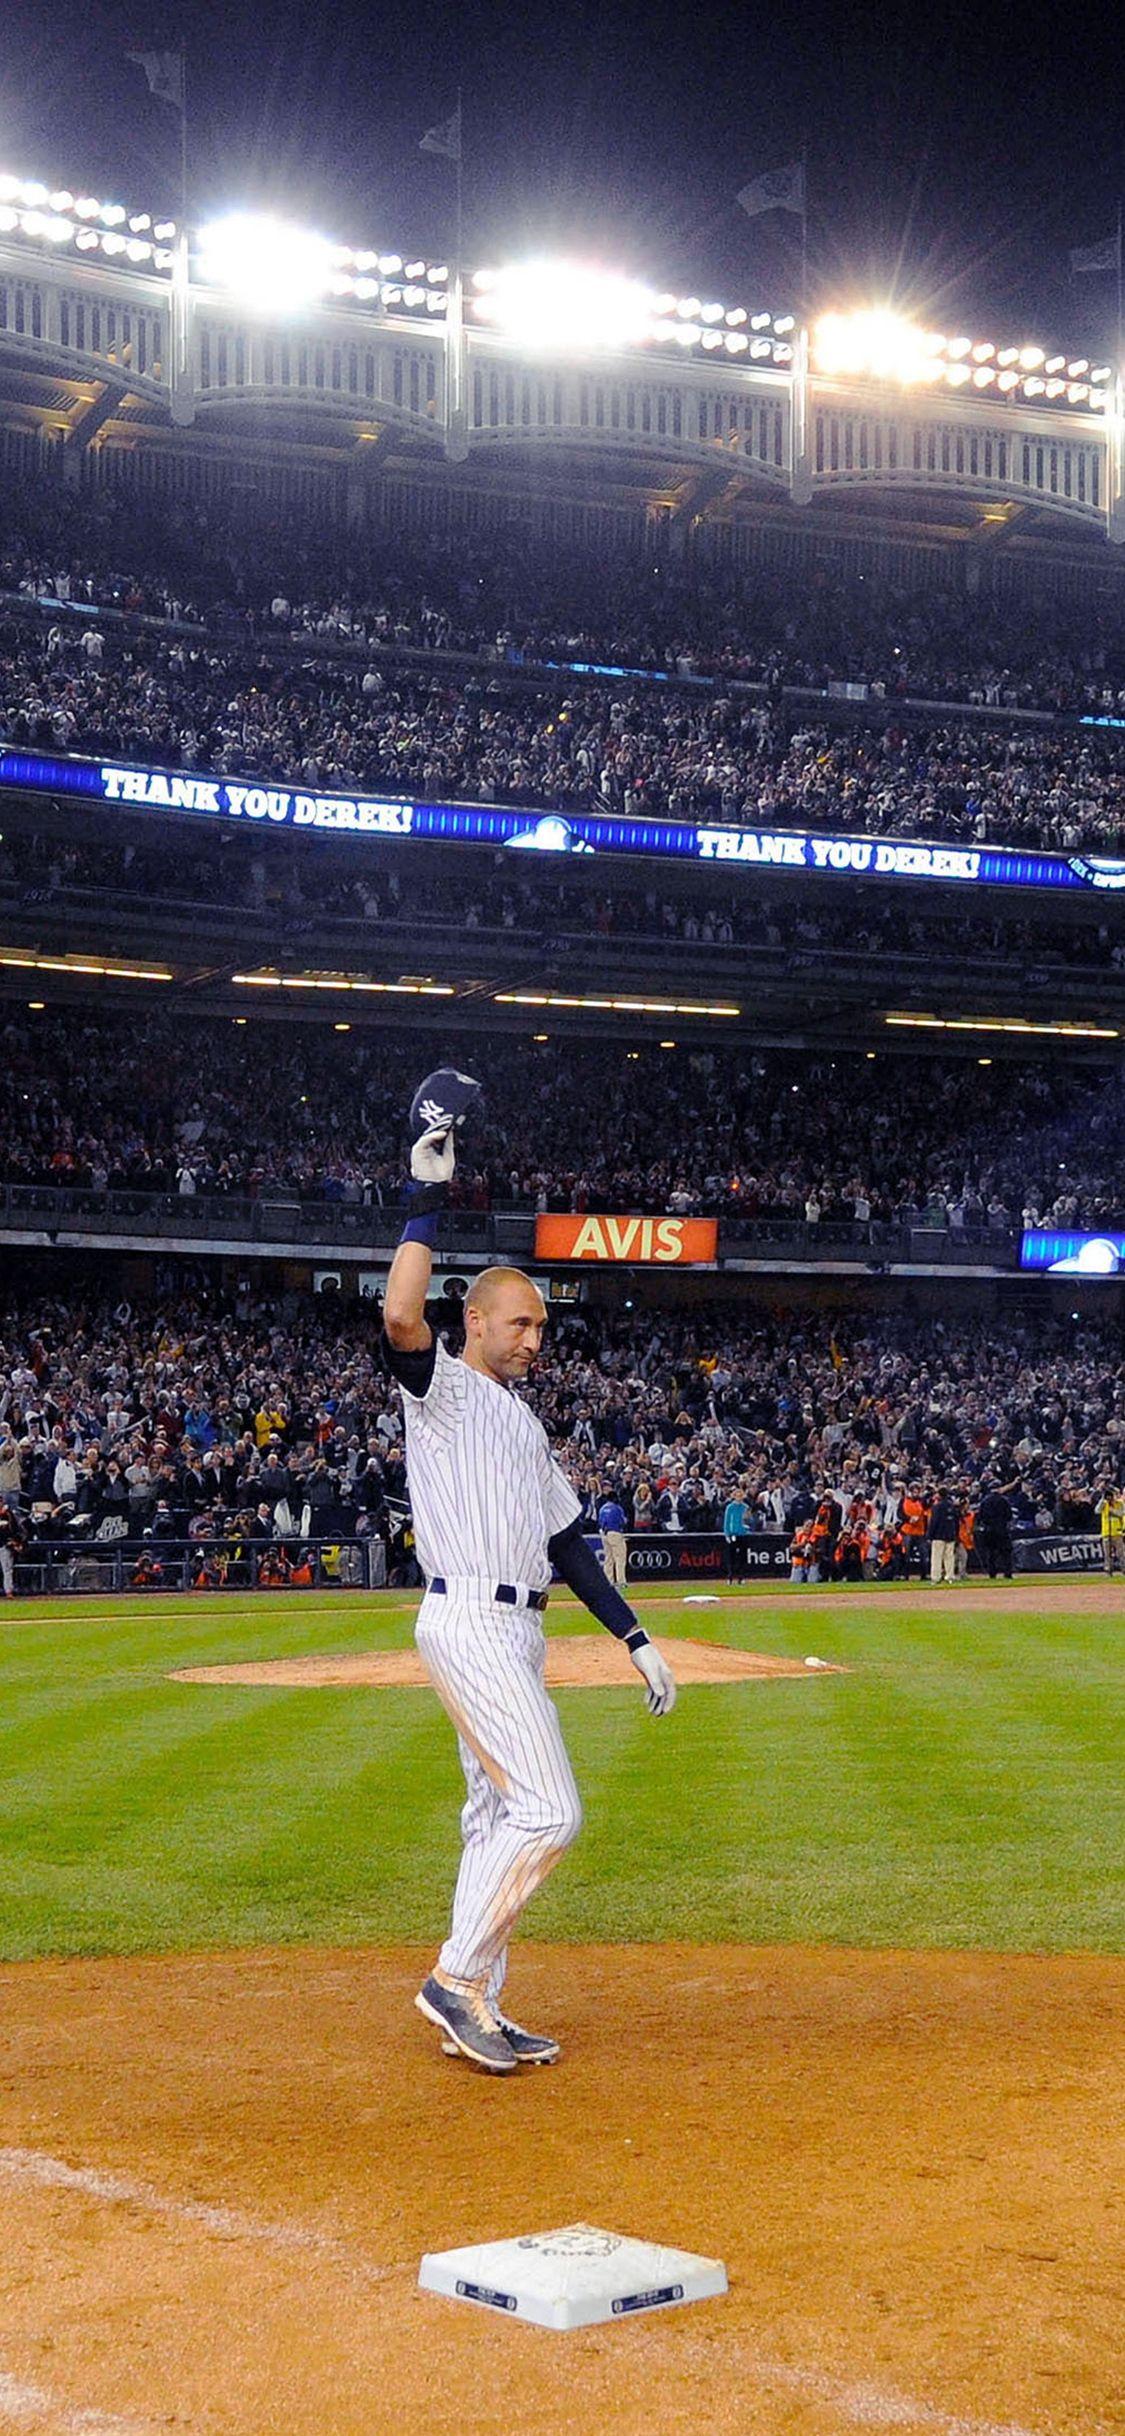 Derek Jeter Walk Off Single Iphone X Wallpaper Derek Jeter Derek Jeter Wallpaper New York Yankees